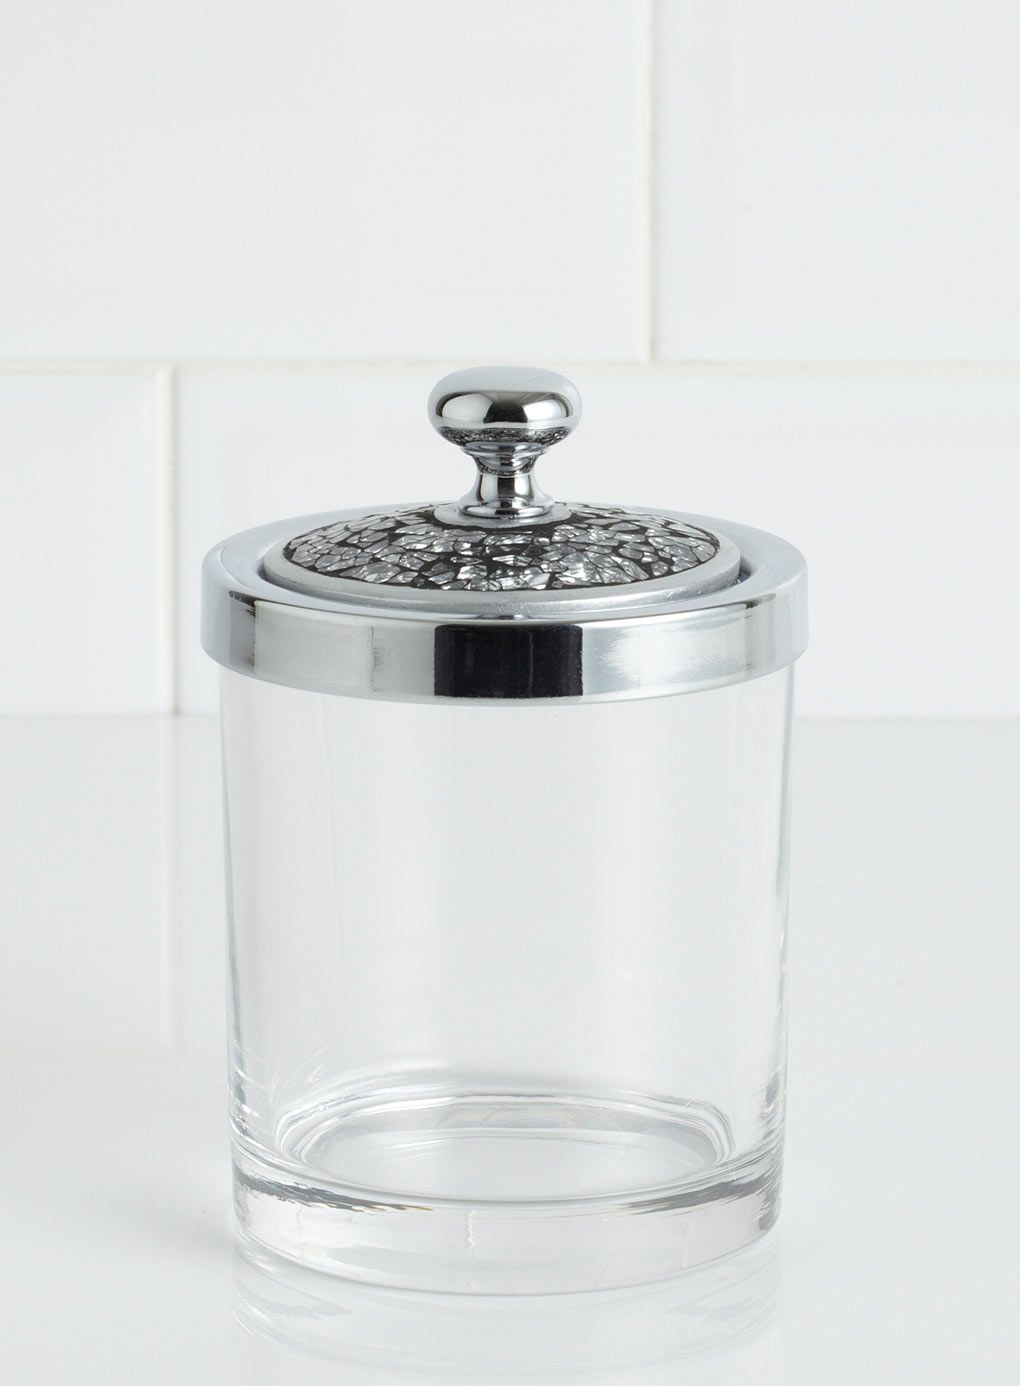 Bhs Bathroom Storage Small Bling Storage Jar Bhs Bathroom Focus Pinterest Jars